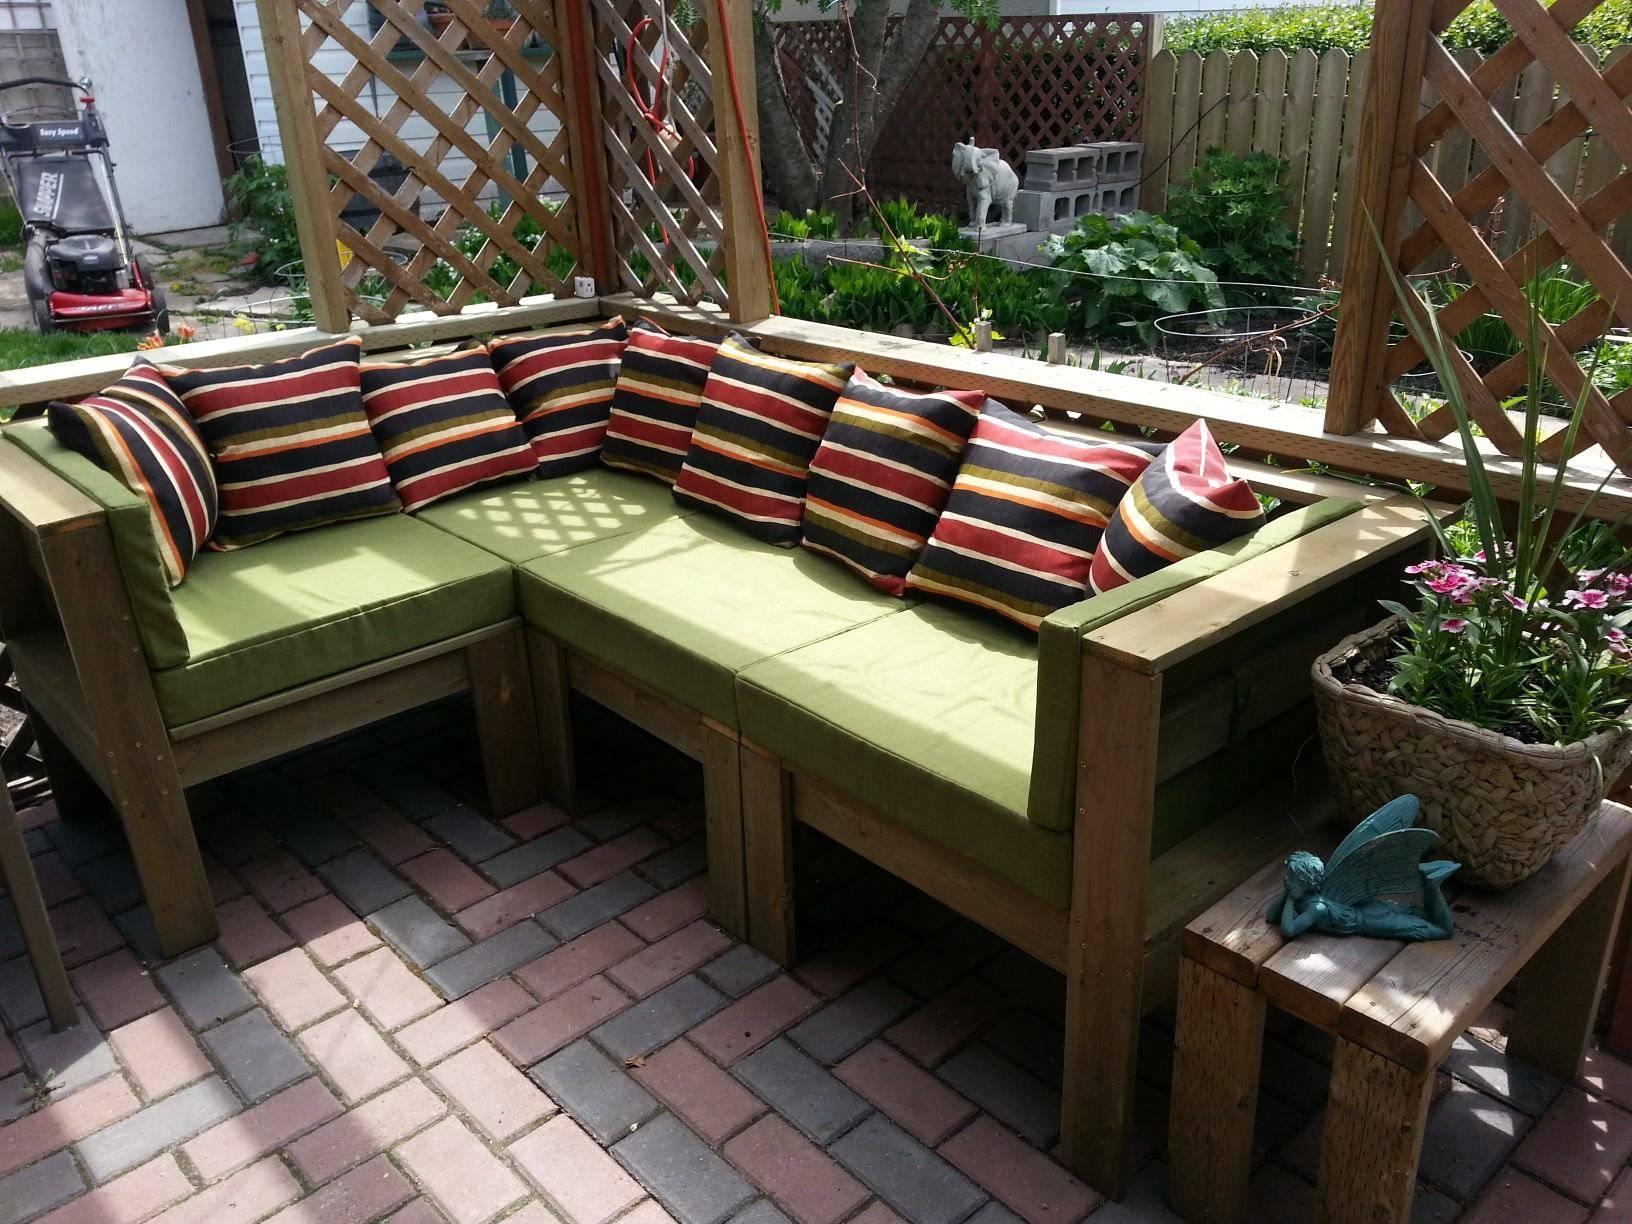 Diy Outdoor Sectional | Home Designfuller regarding Building a Sectional Sofa (Image 17 of 30)